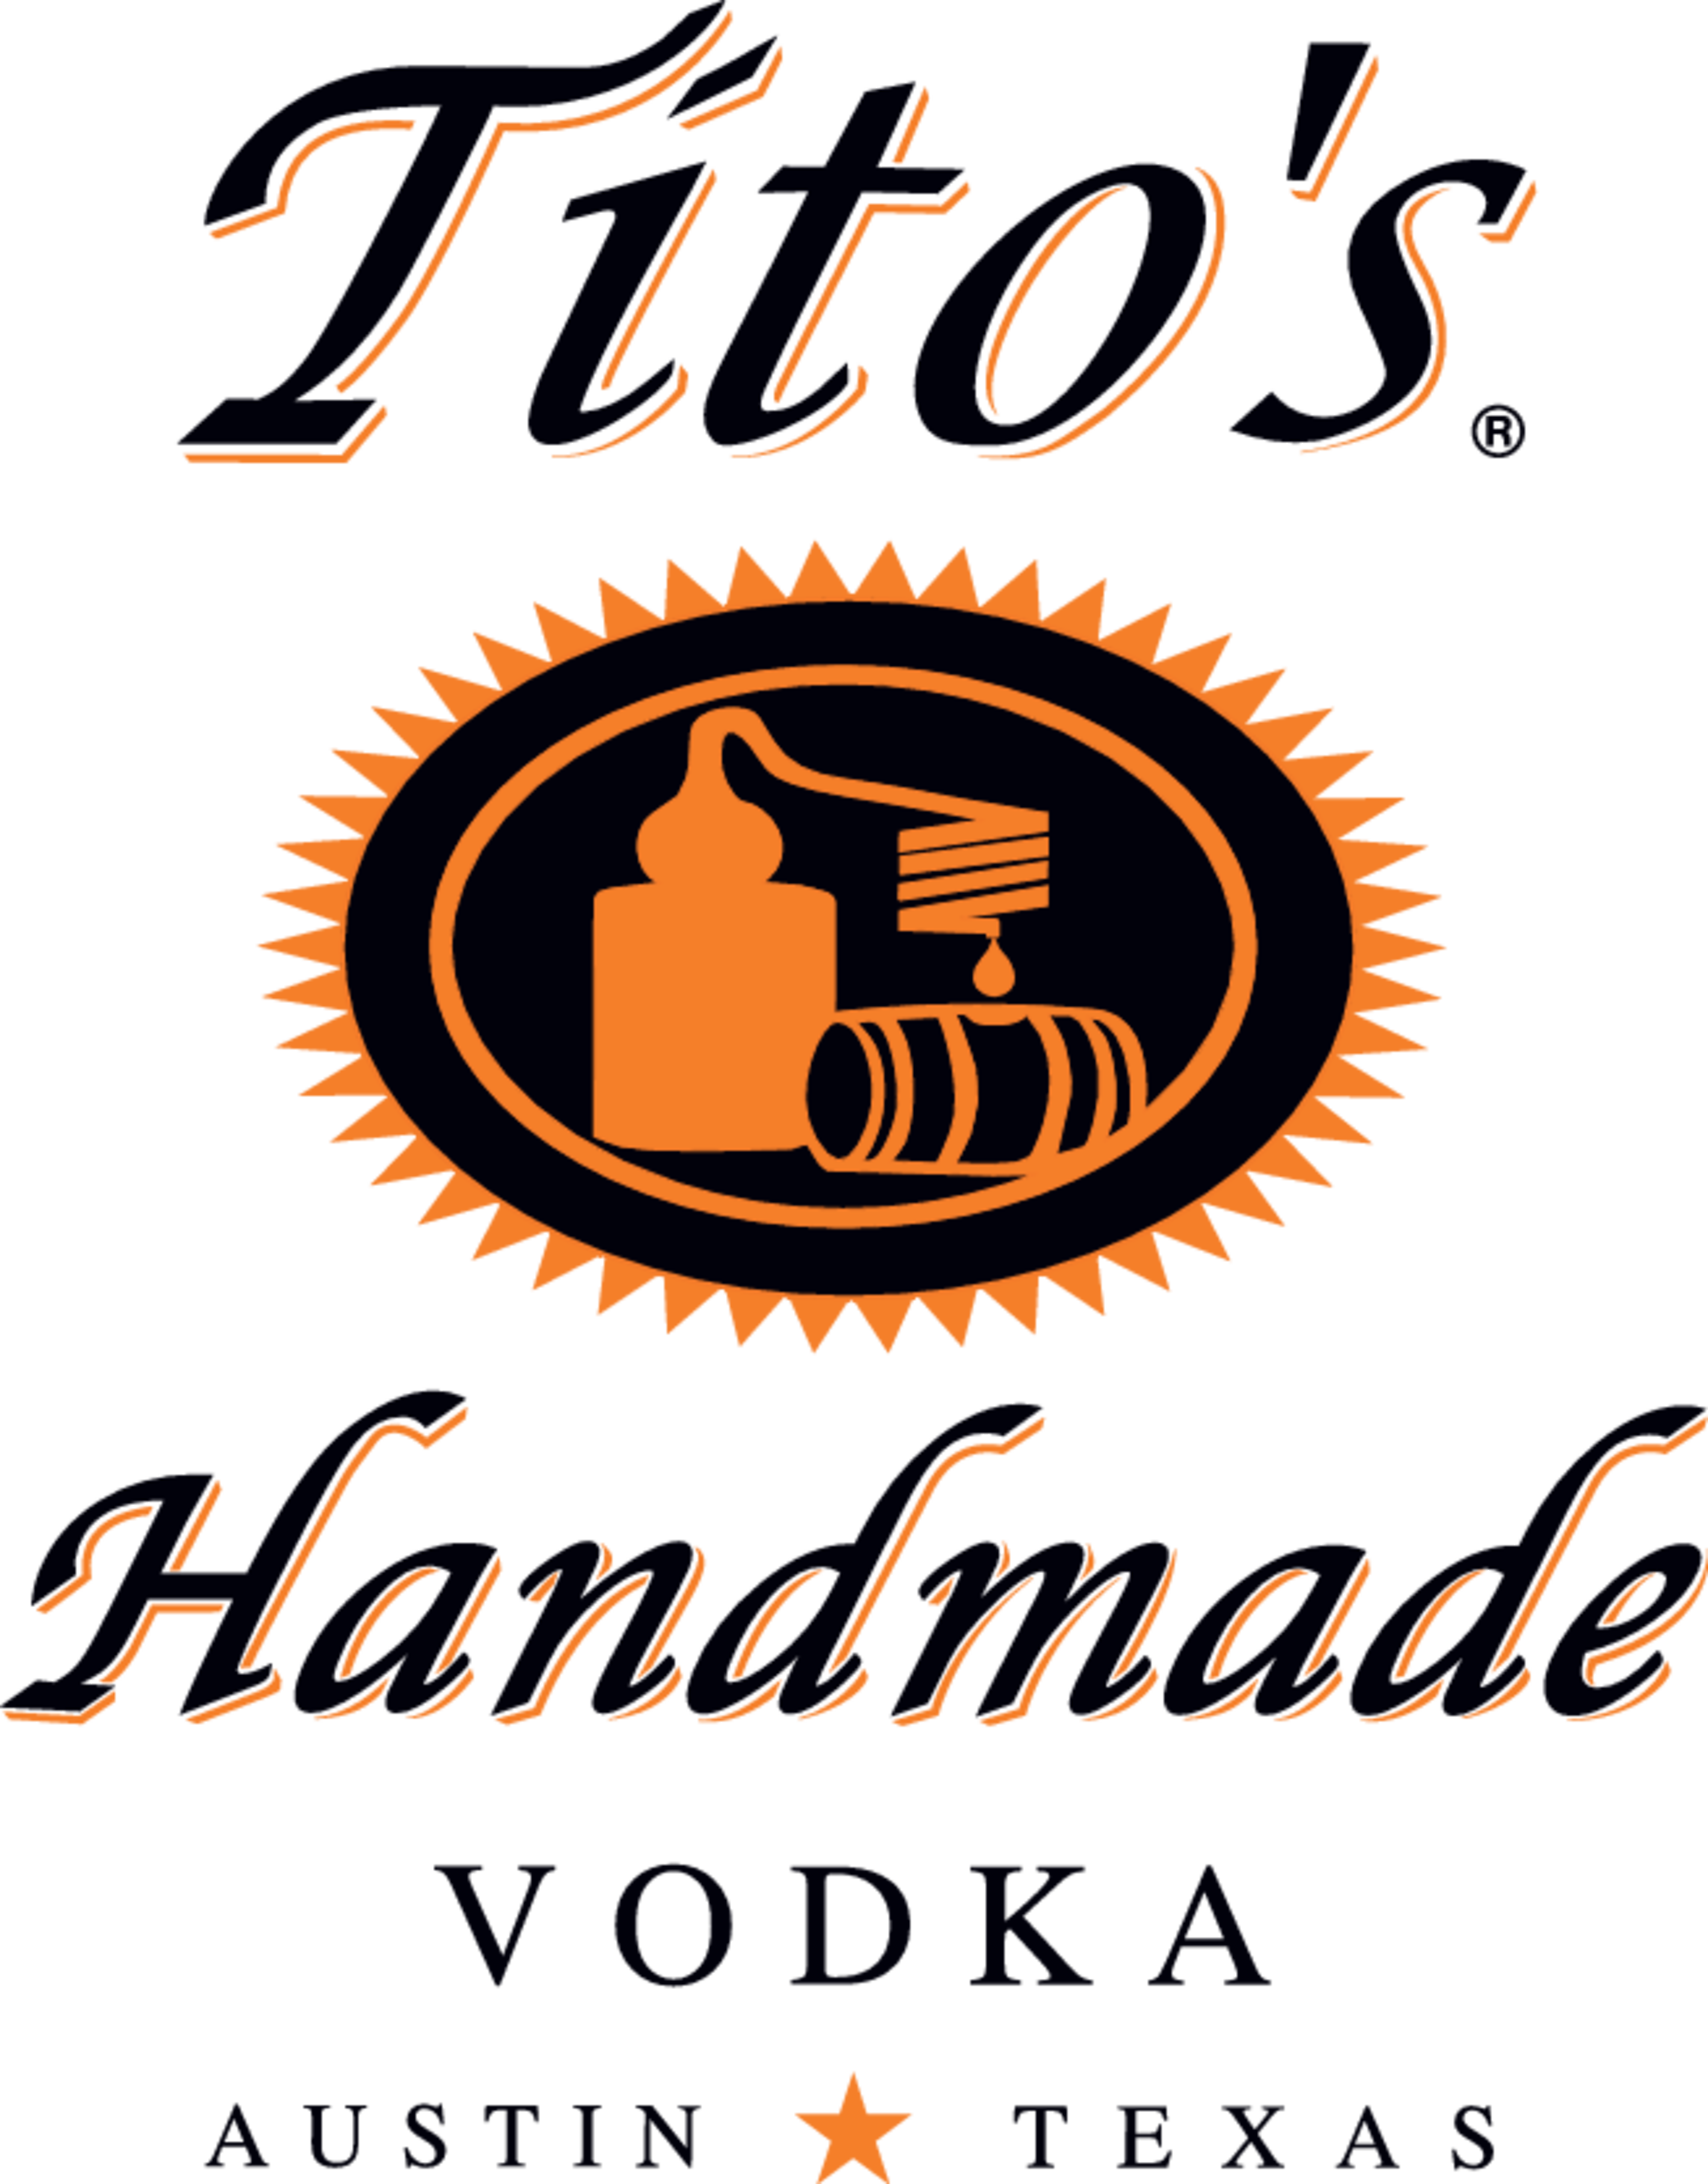 Sponsor Tito's Handmade Vodka